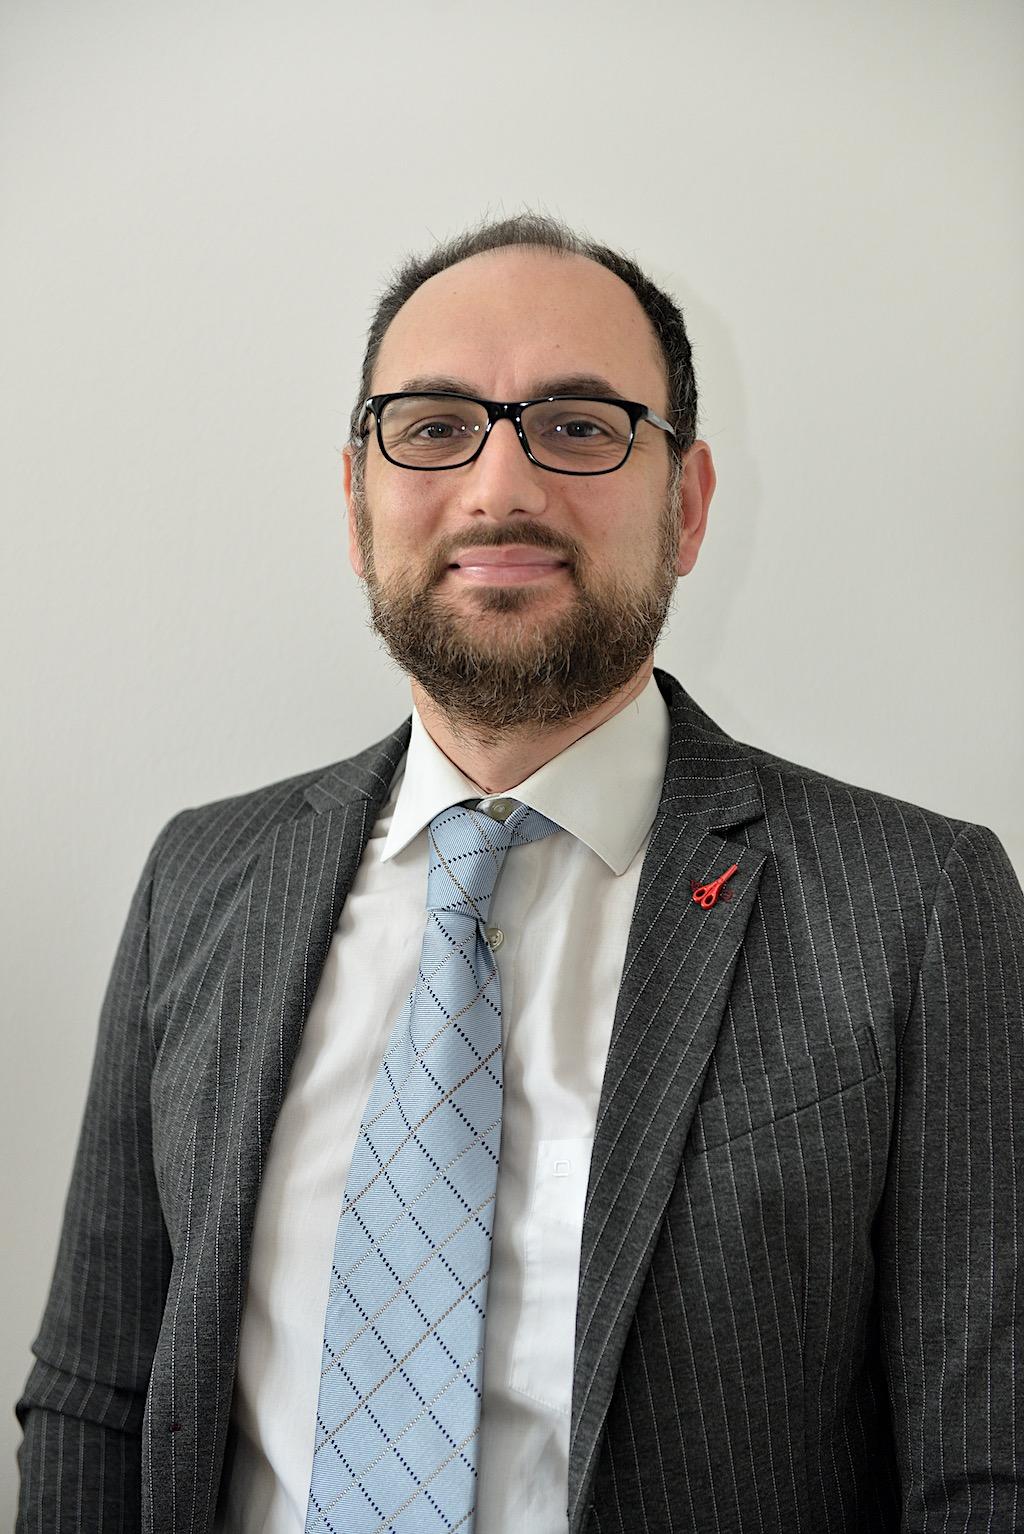 Giacomo Graziano